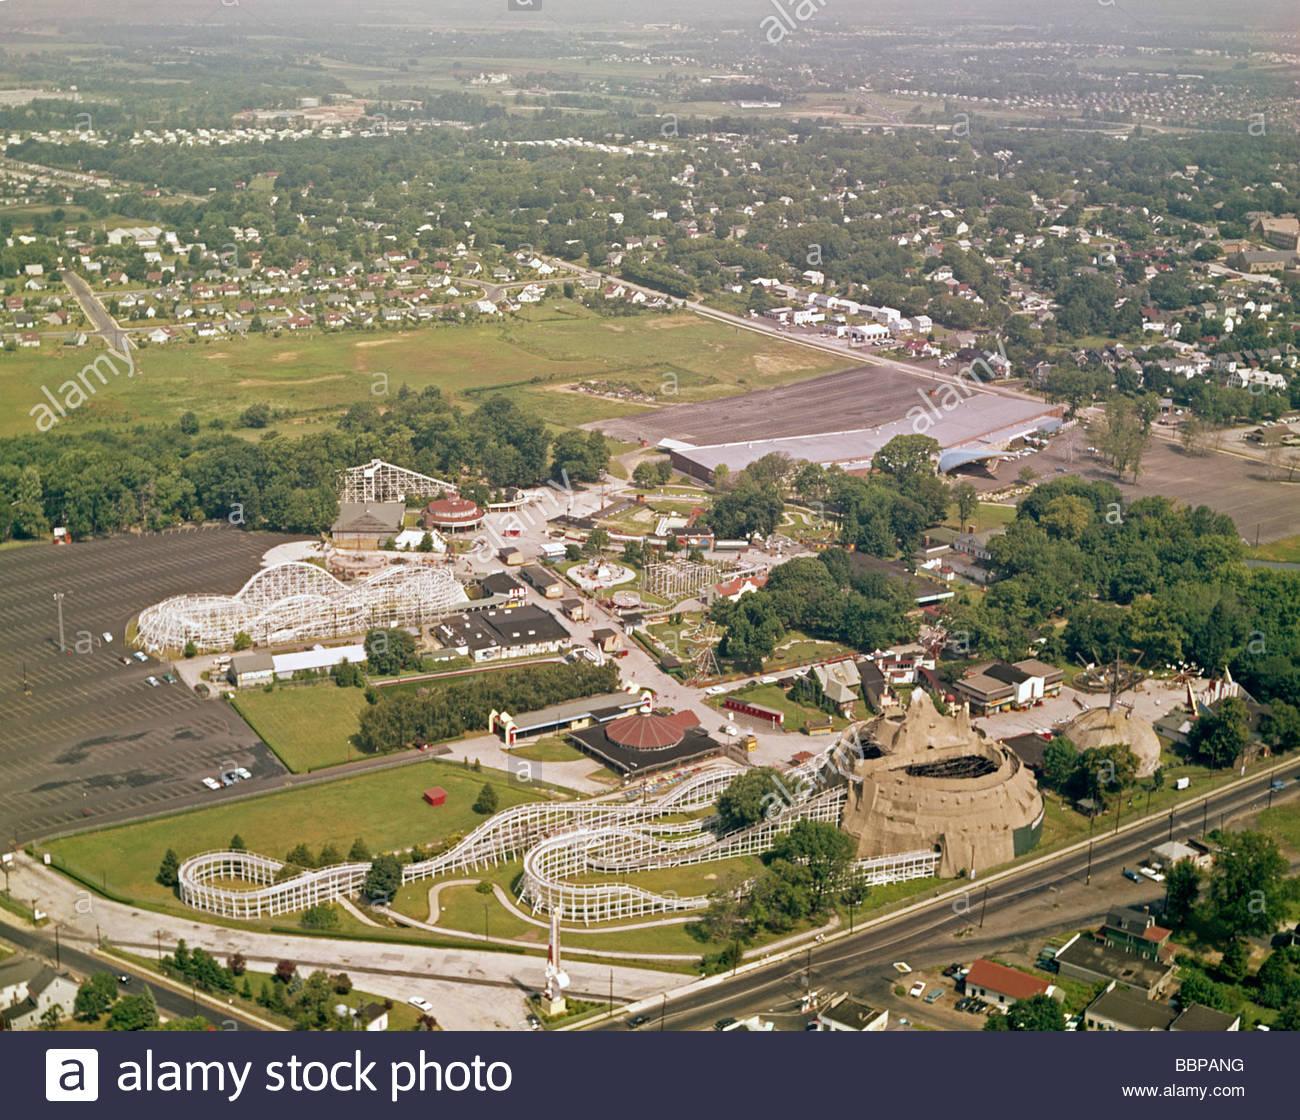 Willow Grove Amusement Park In Willow Grove, Pennsylvania